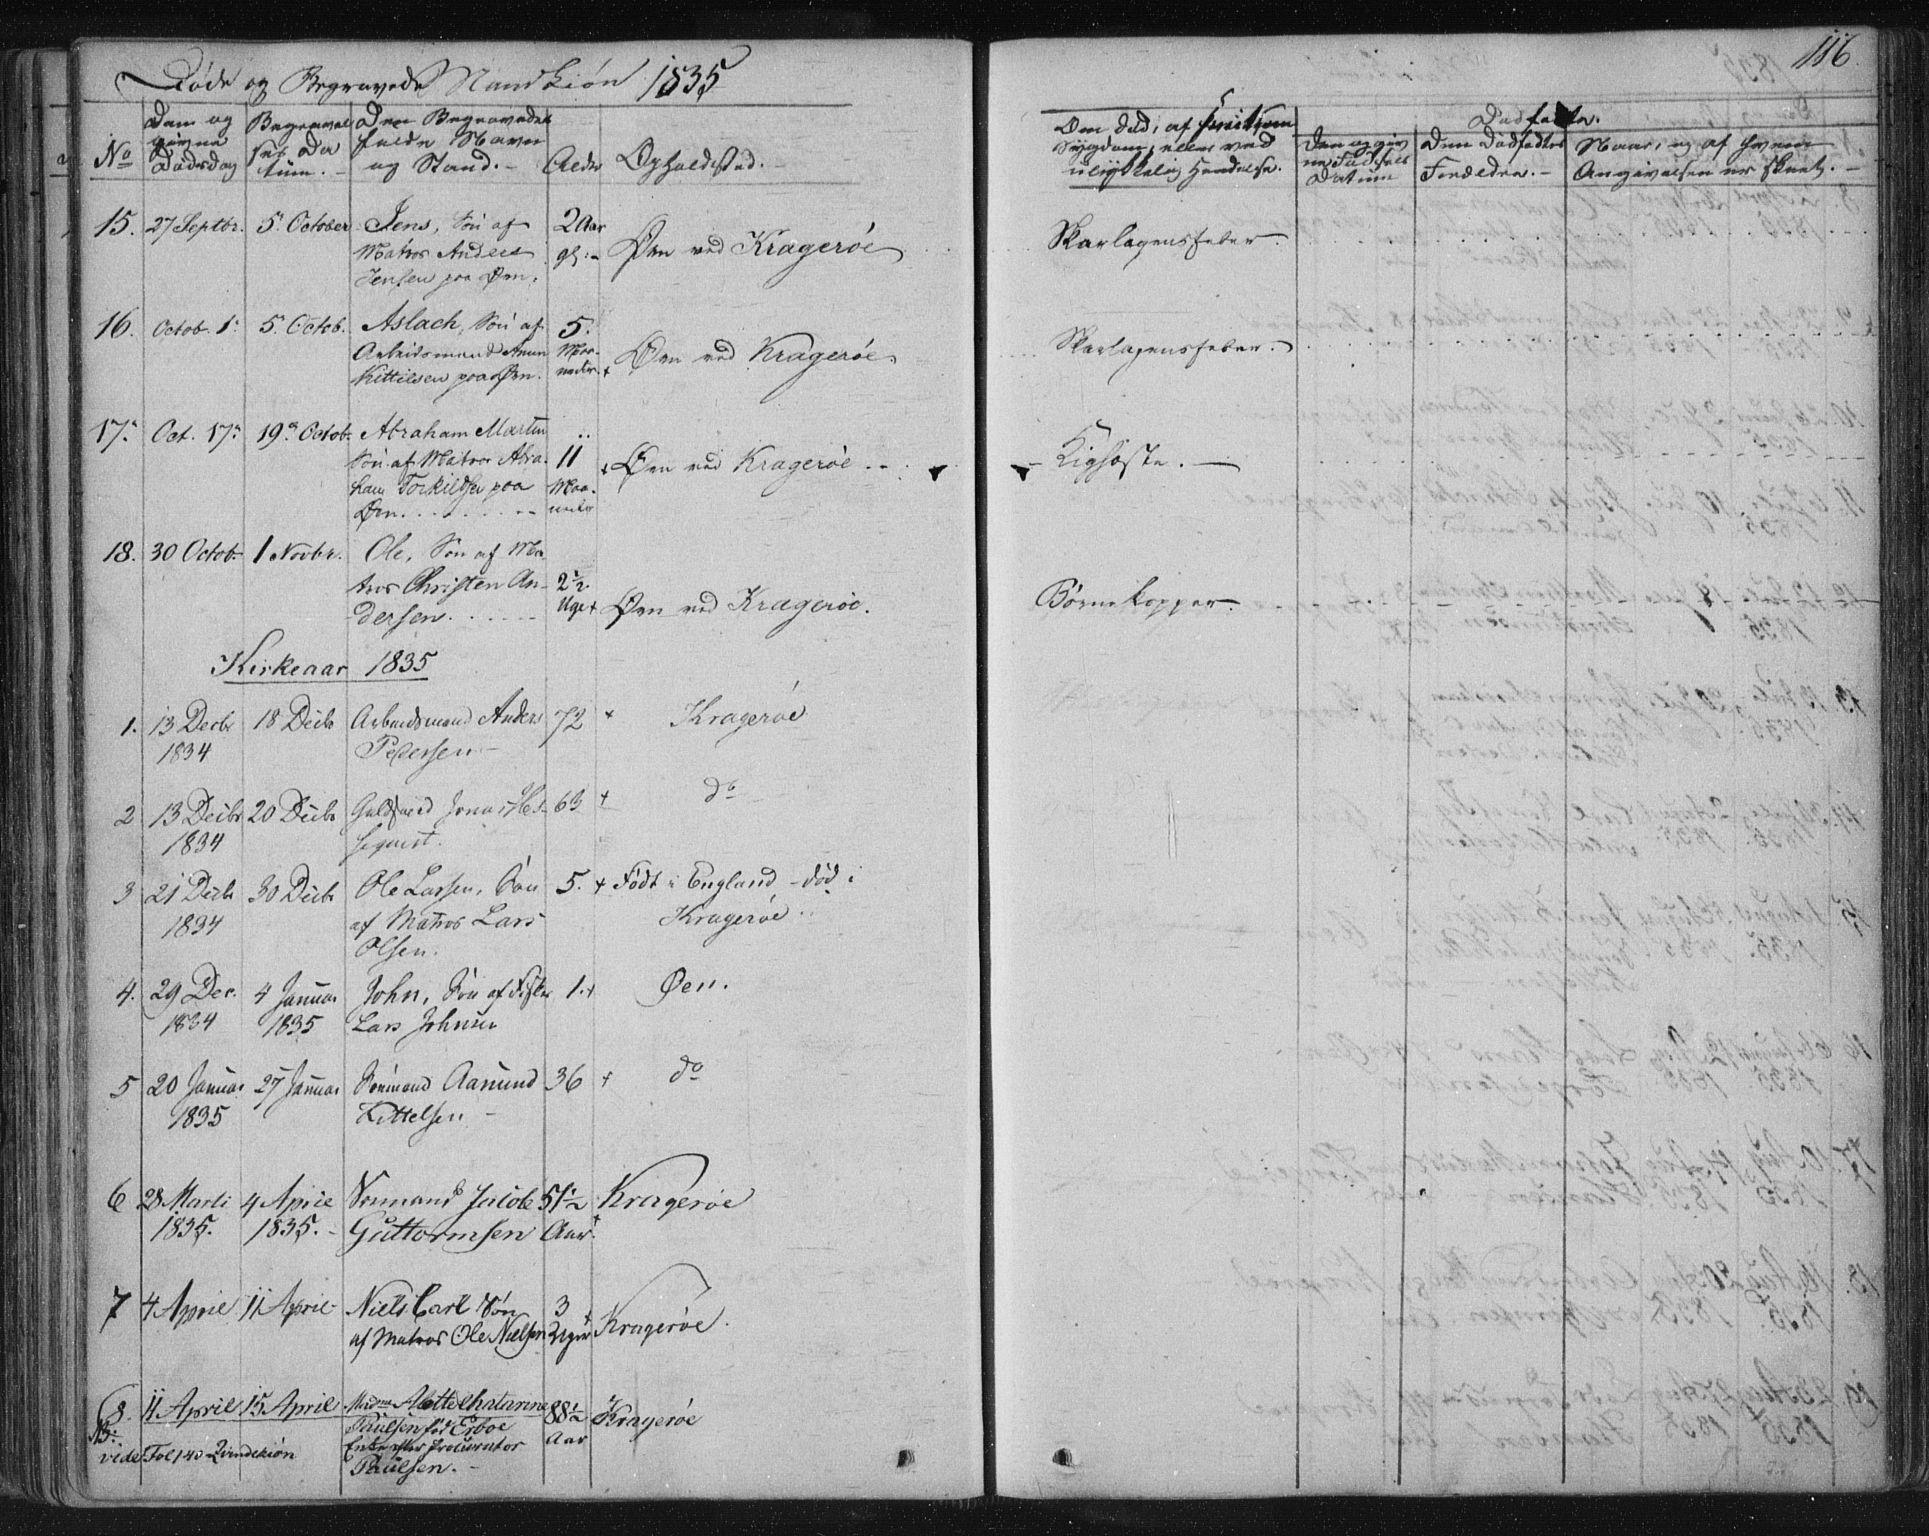 SAKO, Kragerø kirkebøker, F/Fa/L0005: Ministerialbok nr. 5, 1832-1847, s. 116